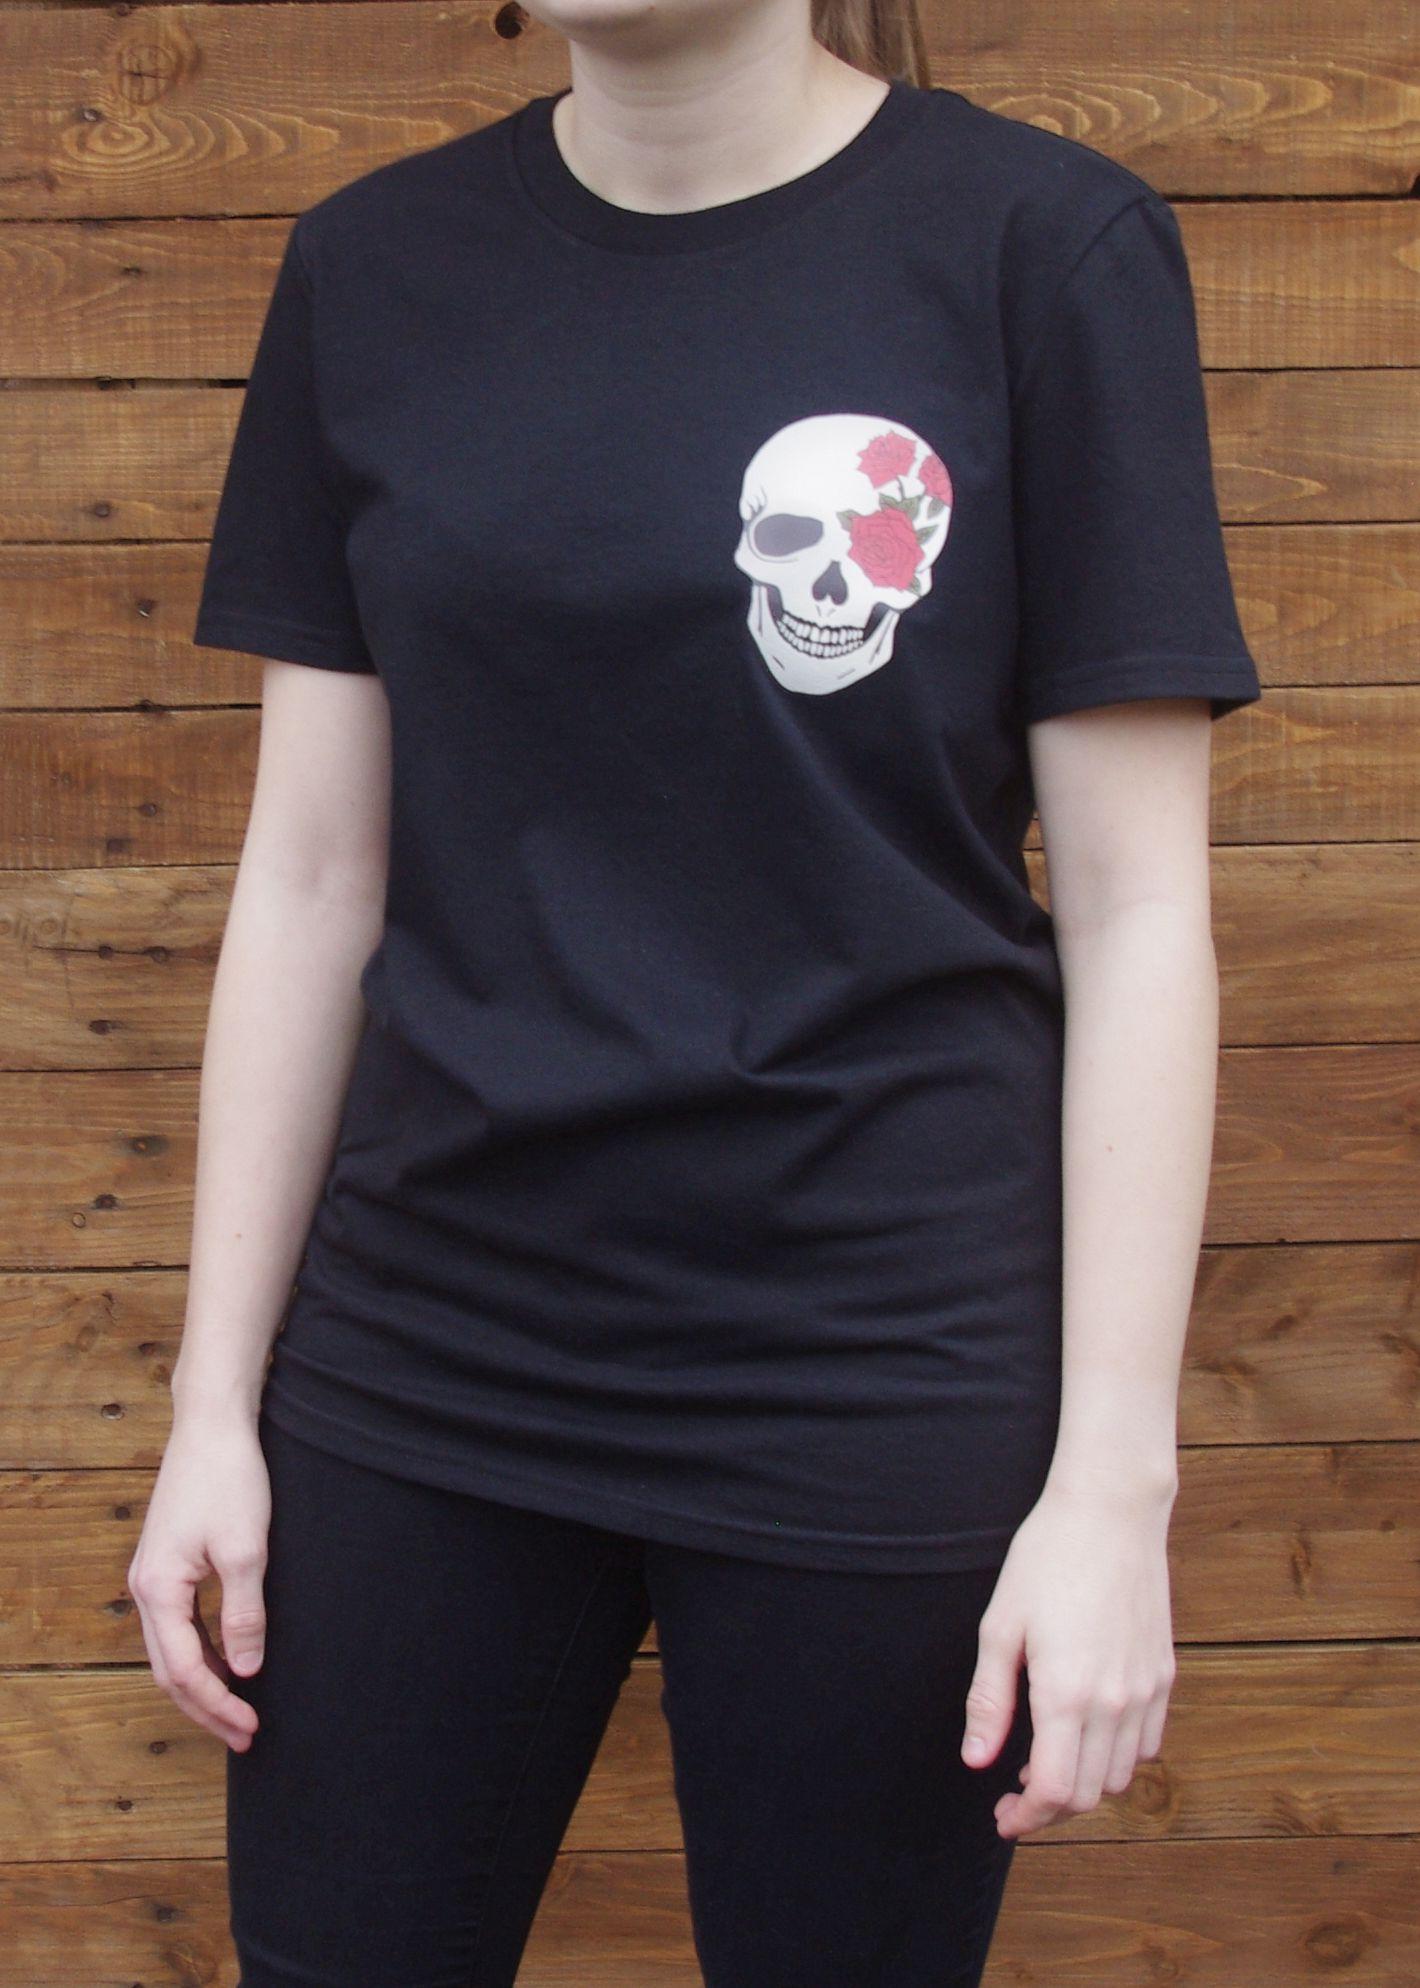 womens goth skull tee black mens outfit shirt skullgift alternative unisex tattoo art